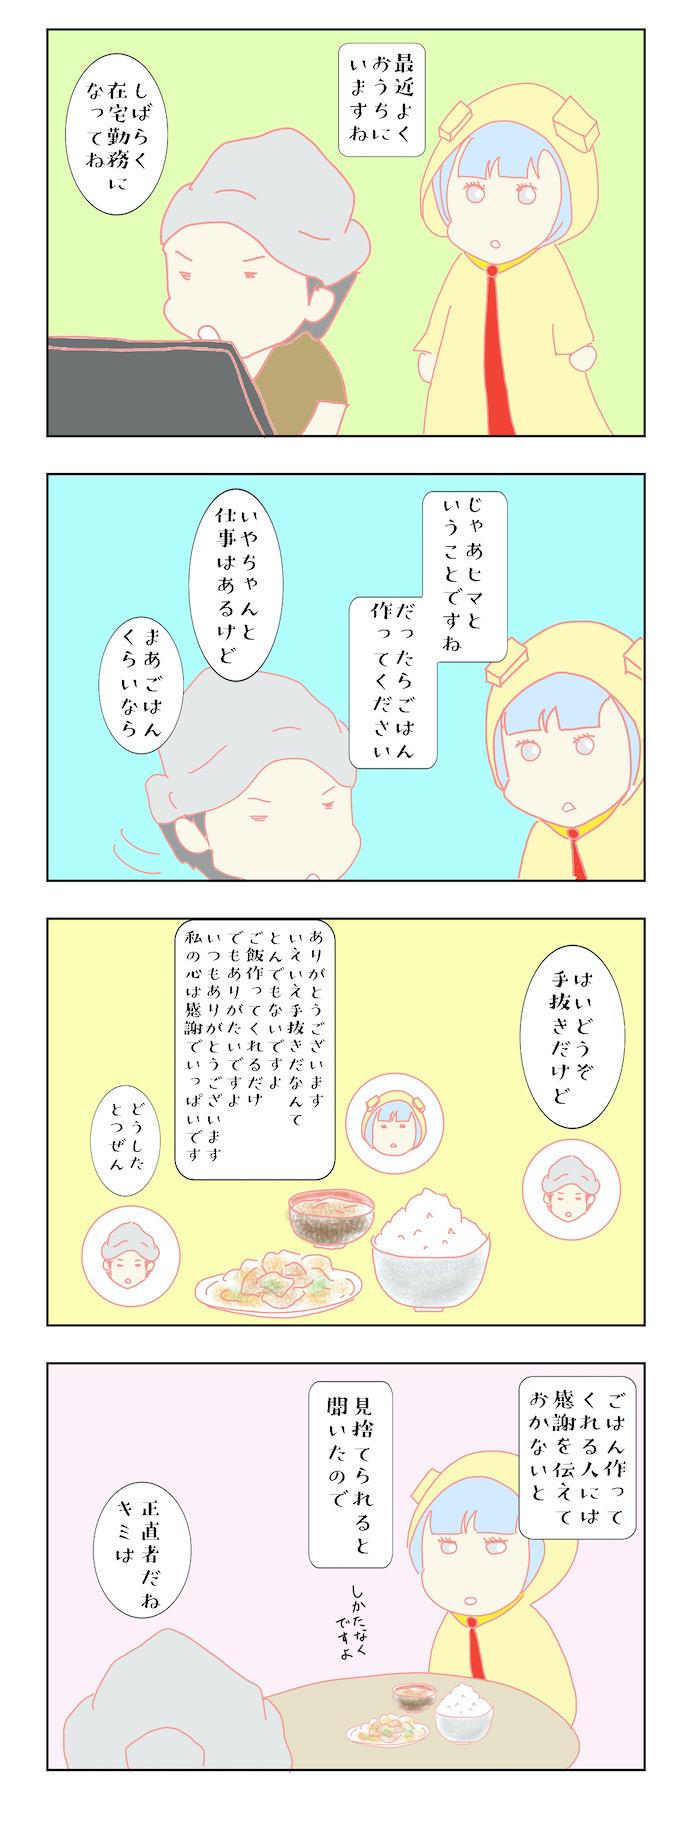 kimura_2004_01